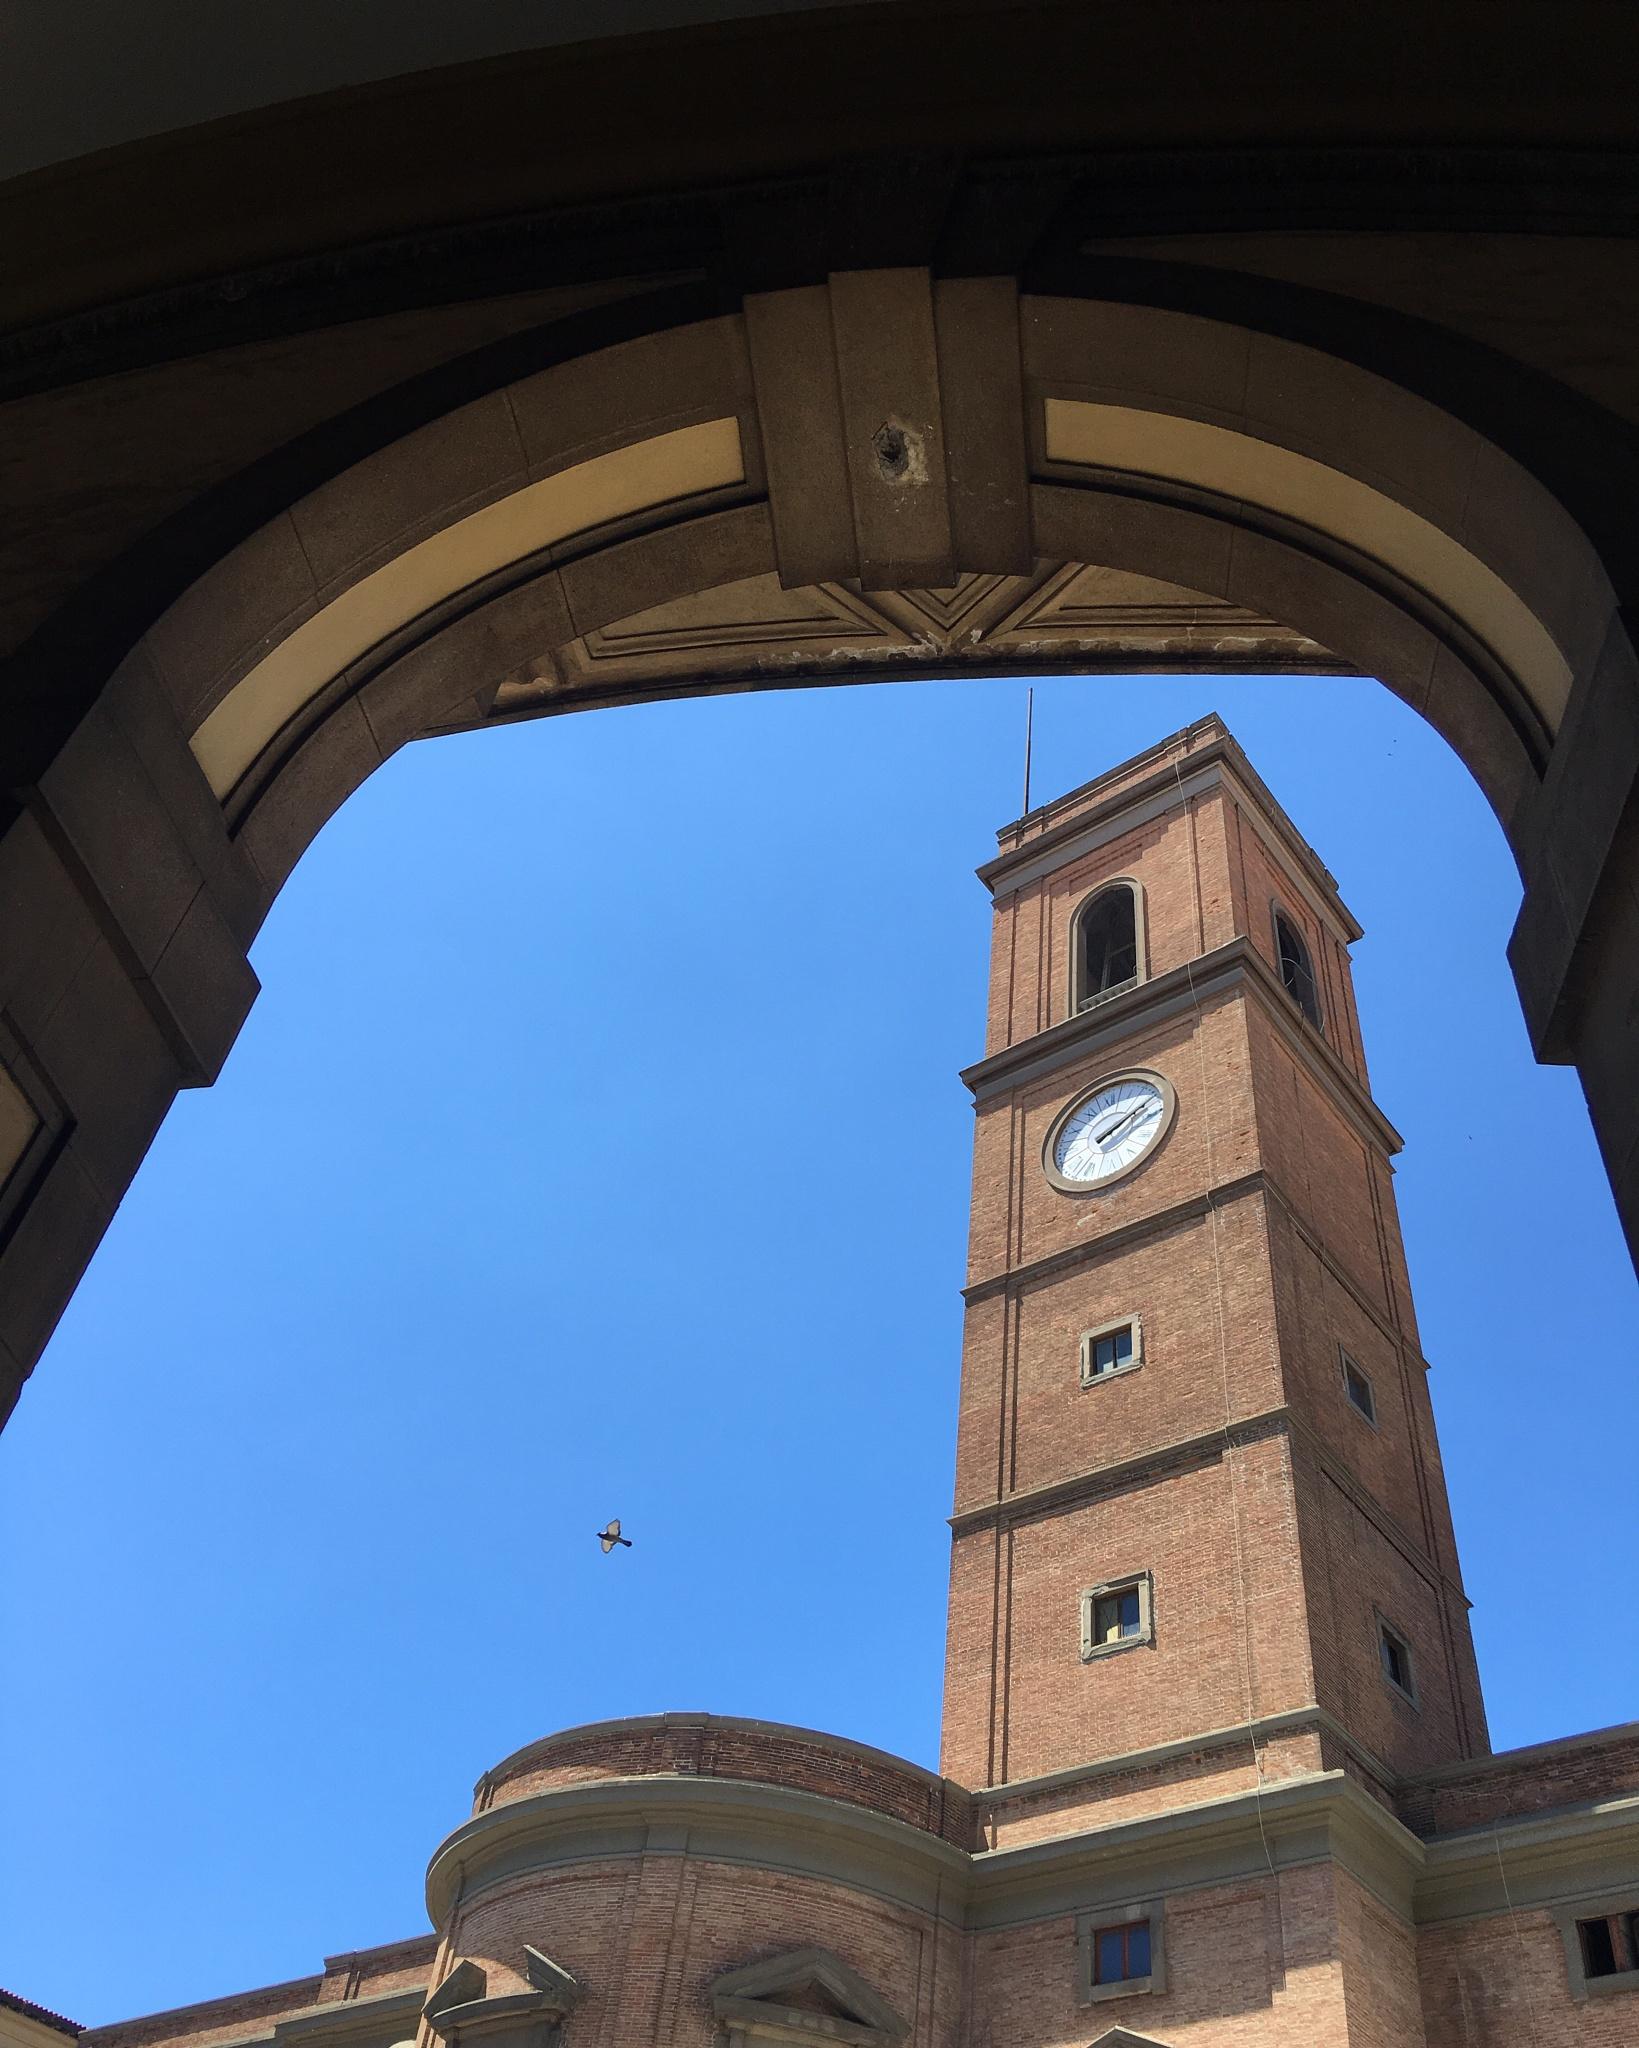 Clock Tower by arlenensik